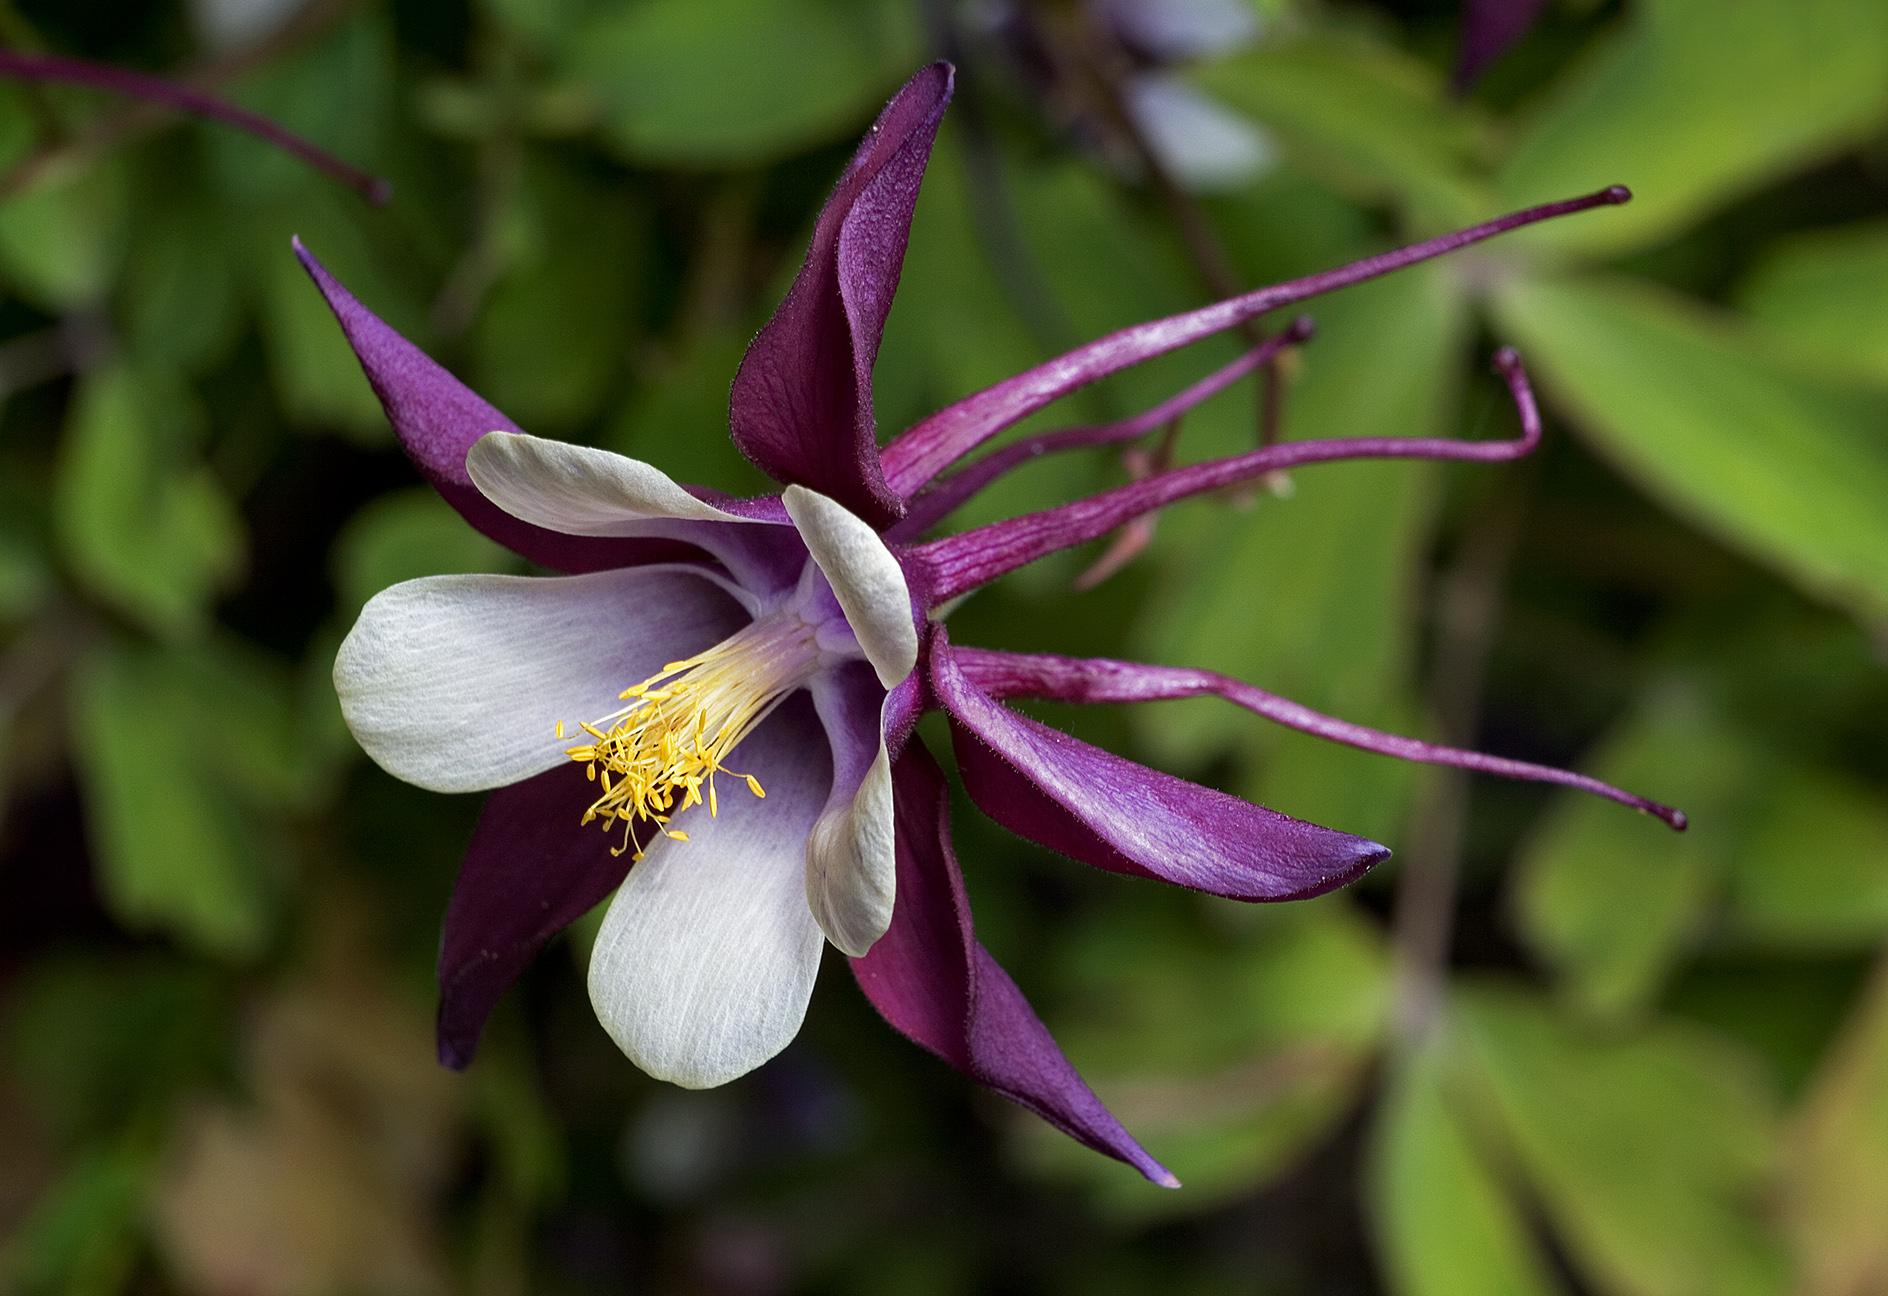 File:Aquilegia columbine magpie cultivar 2.jpg - Wikipedia